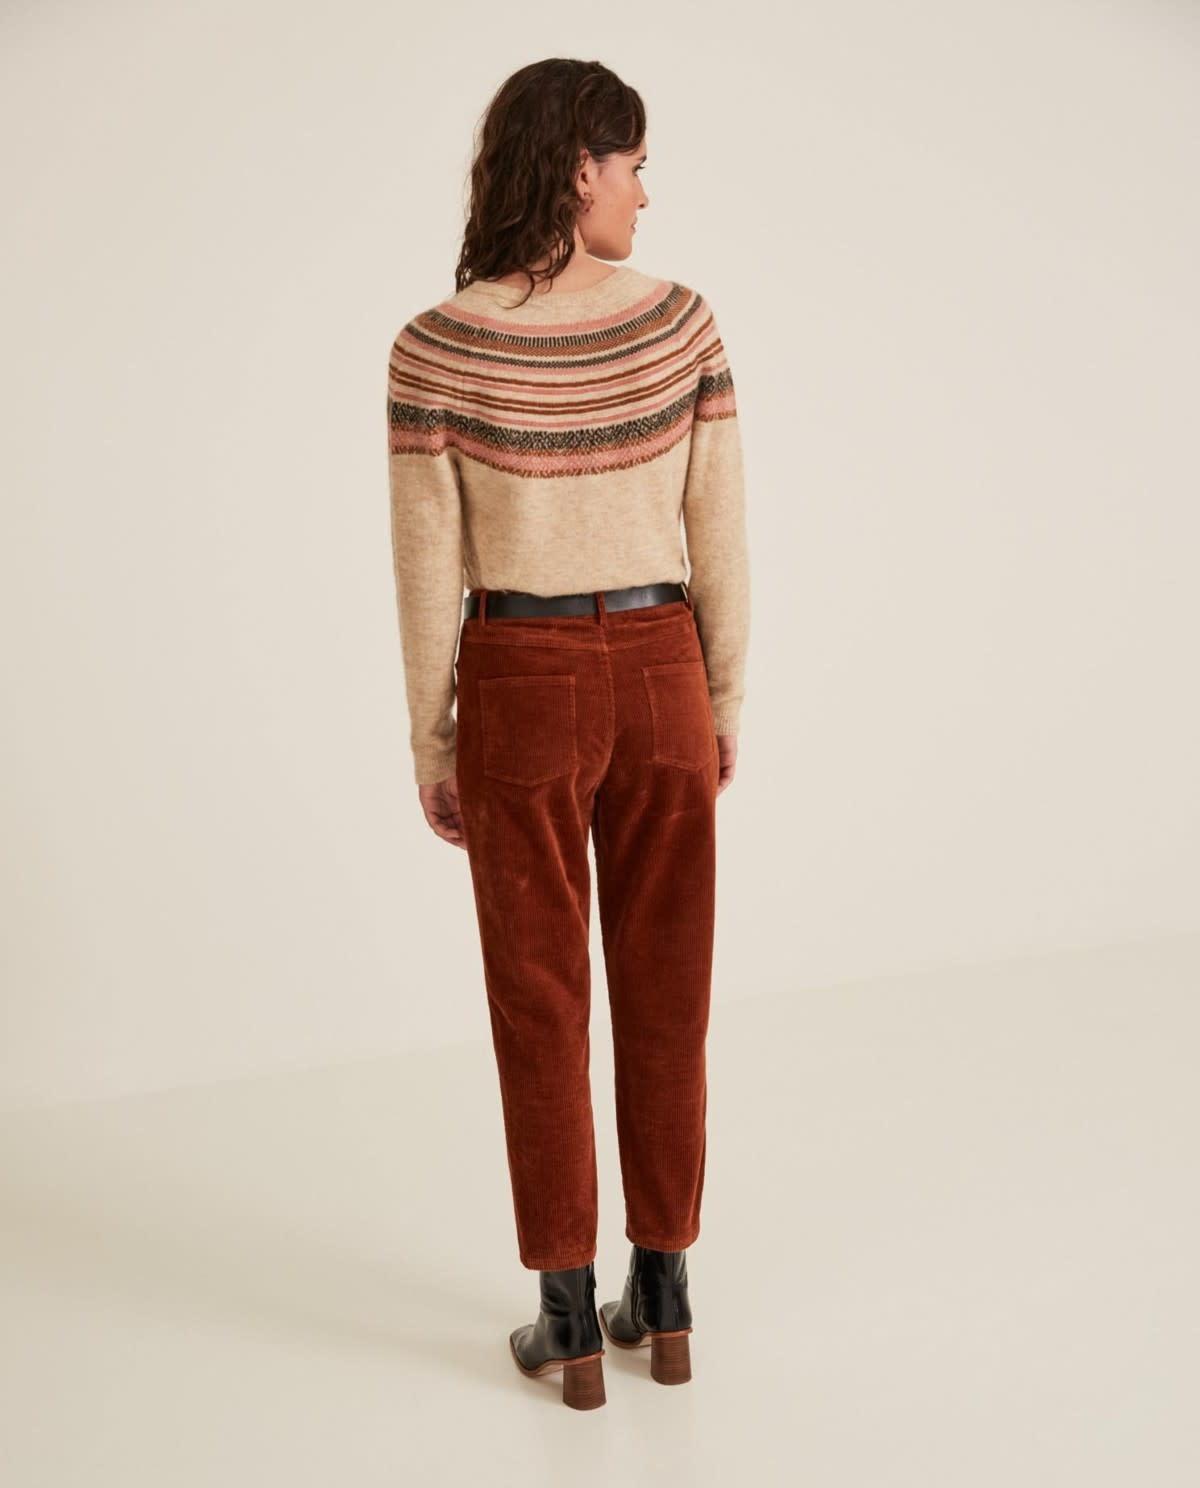 Yerse Marfa33 - Pants